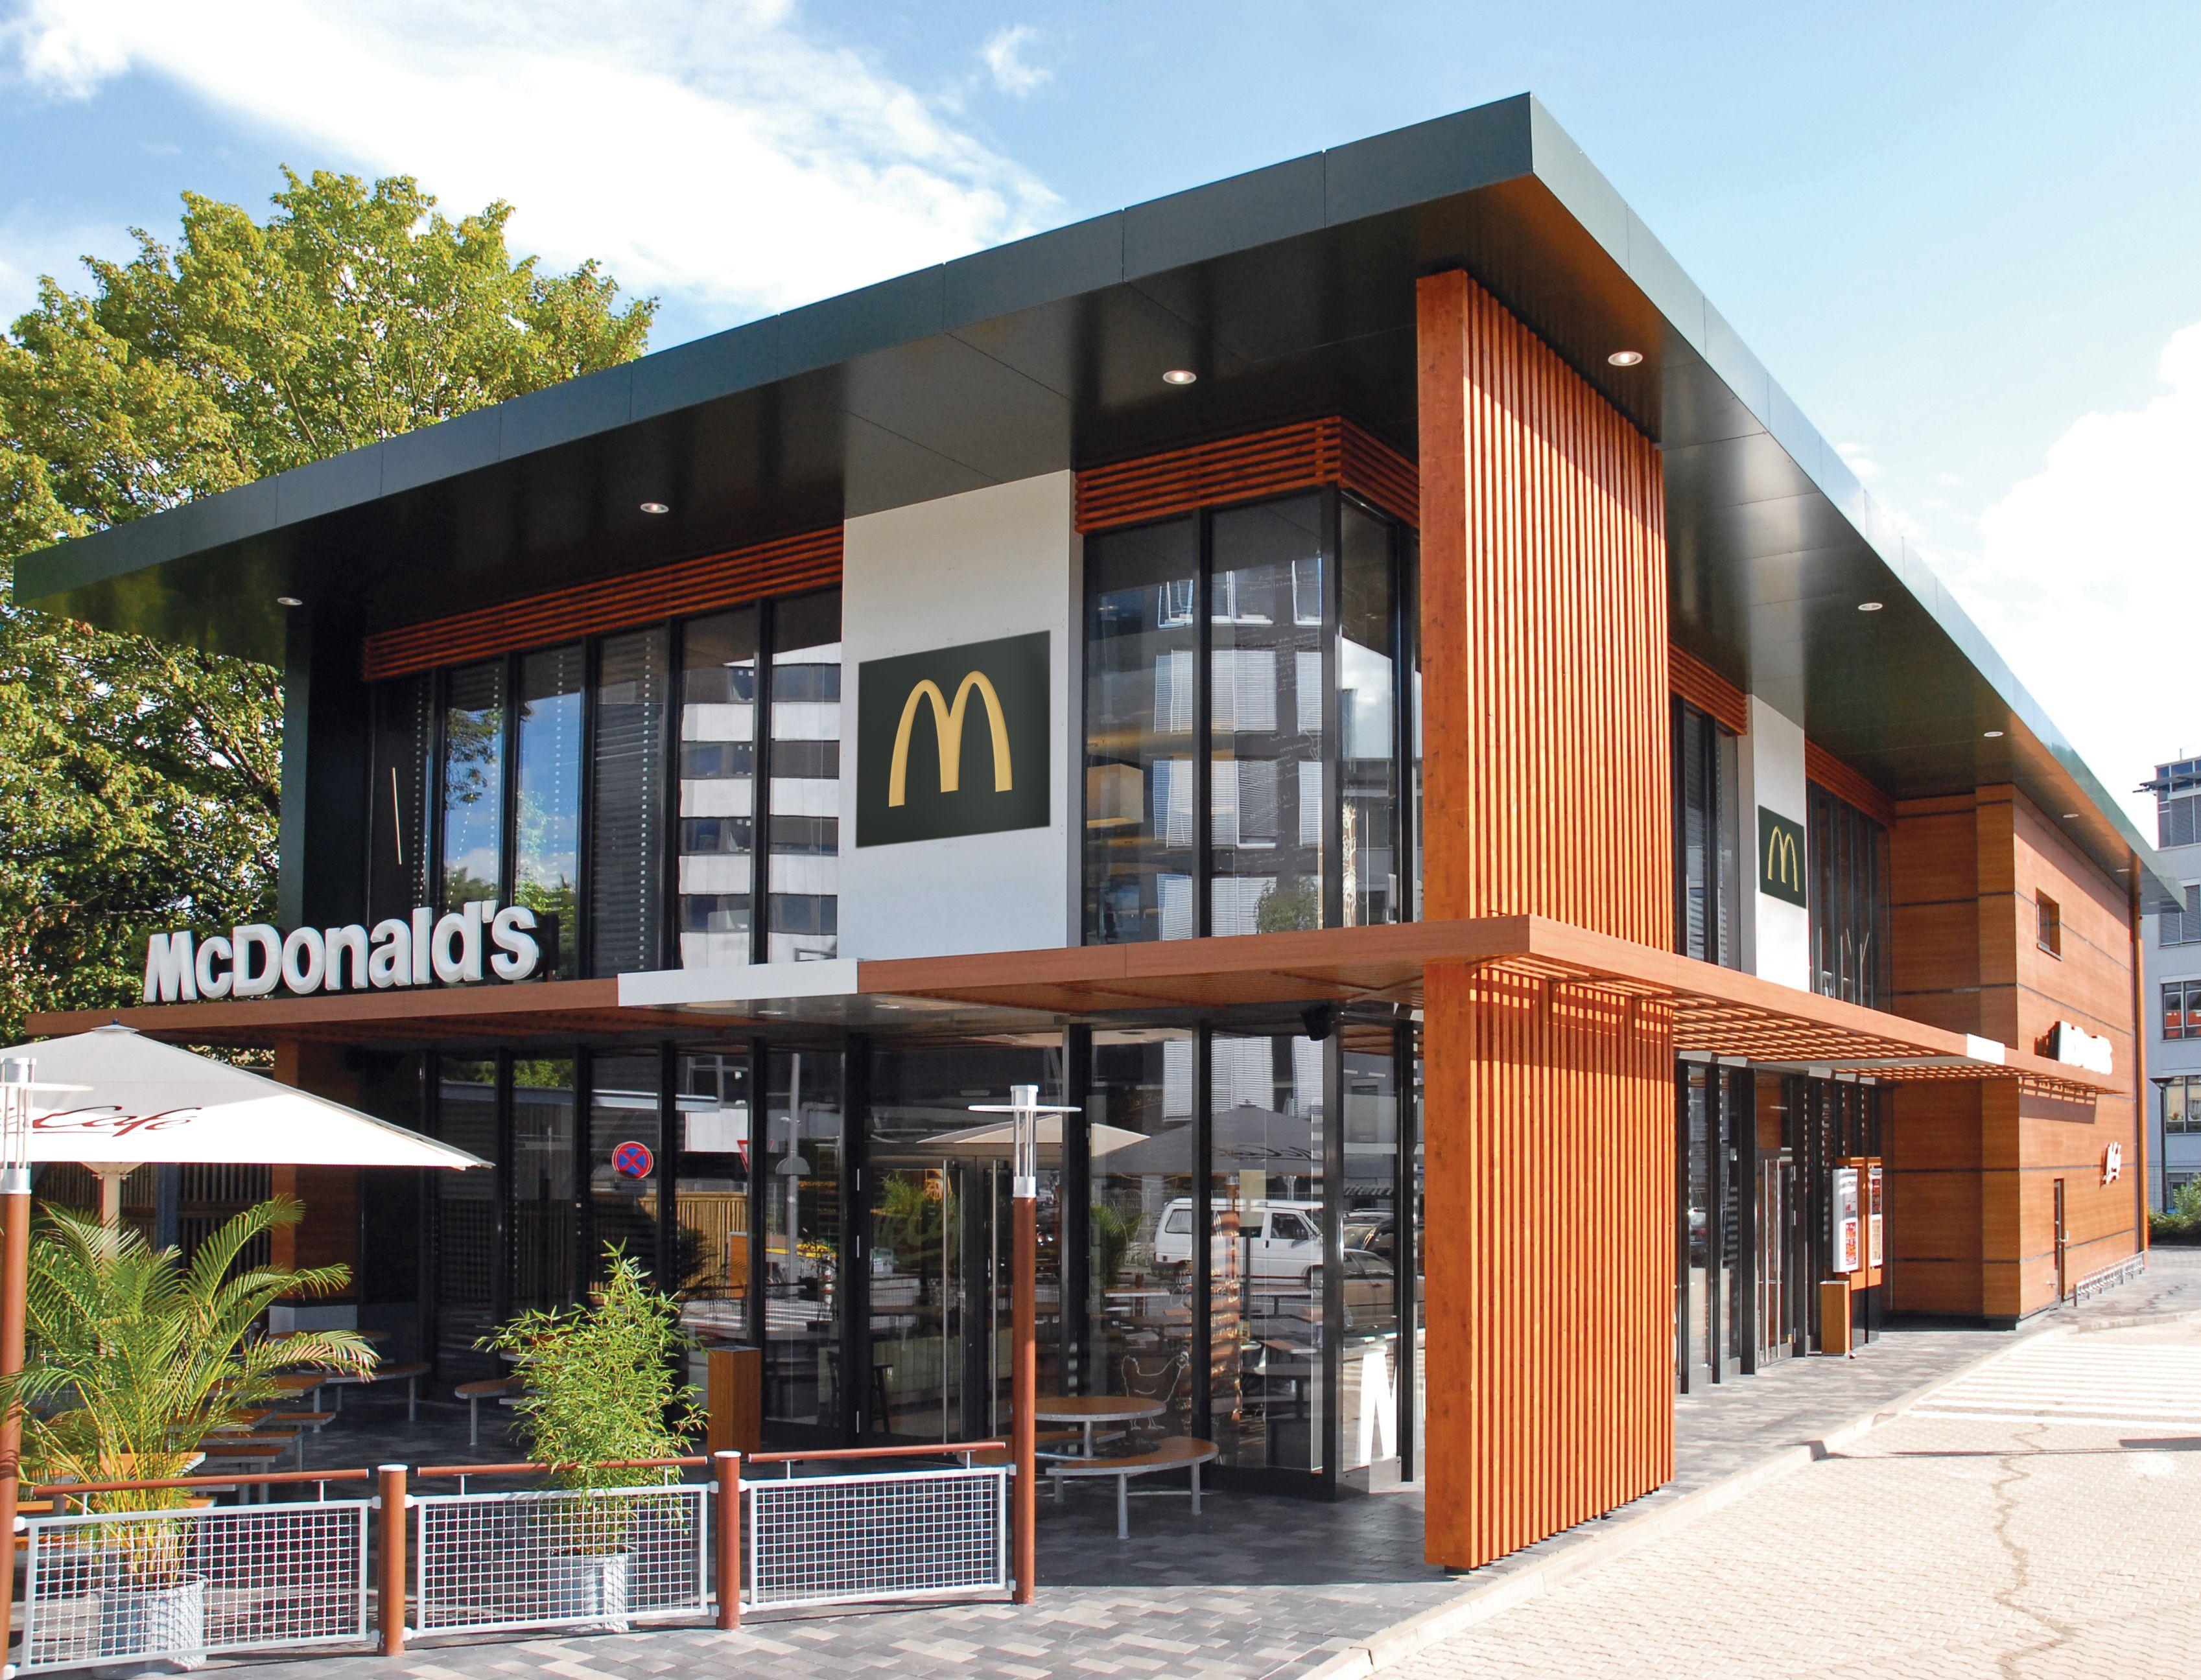 Best Kitchen Gallery: Google Image Result For Mcdpressoffice Eu Photography of Restaurant Exterior Design on rachelxblog.com